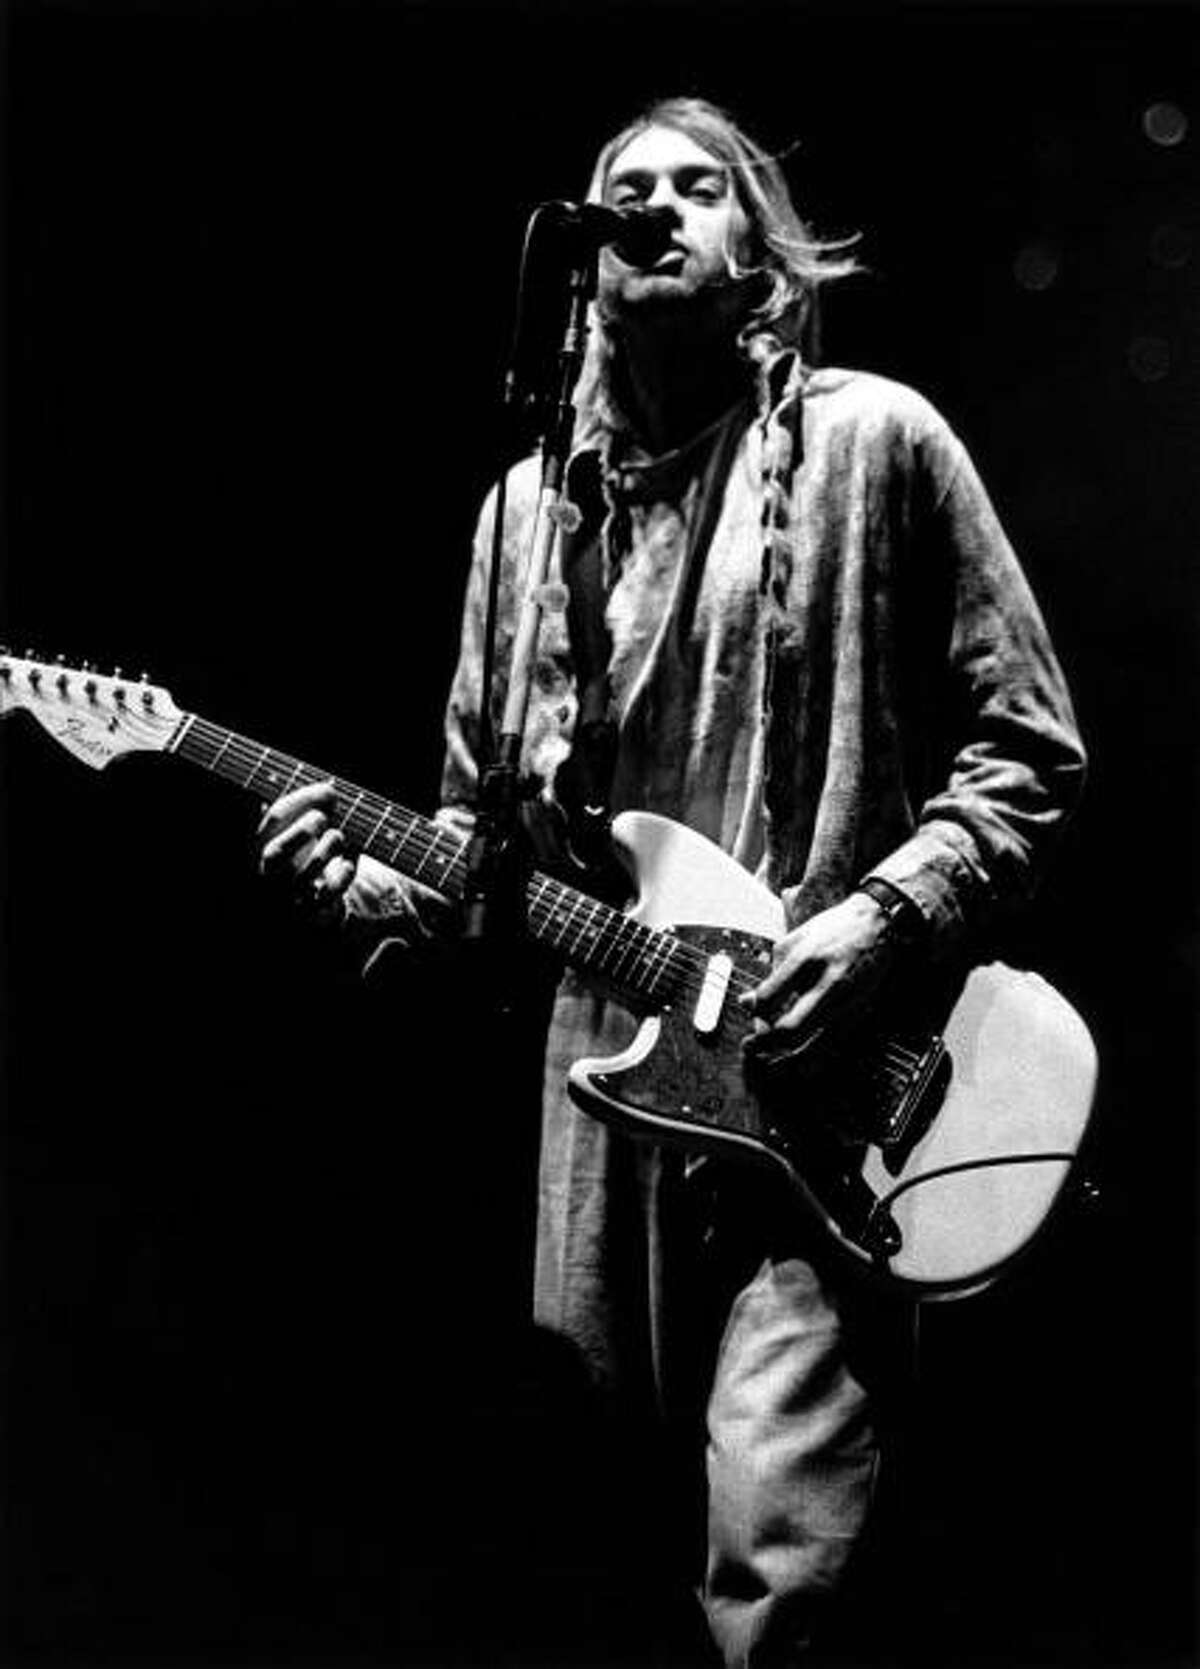 ITALY - FEBRUARY 21: Photo of Kurt COBAIN and NIRVANA; Kurt Cobain performing live onstage at Palasport, Modena, playing Fender Mustang guitar